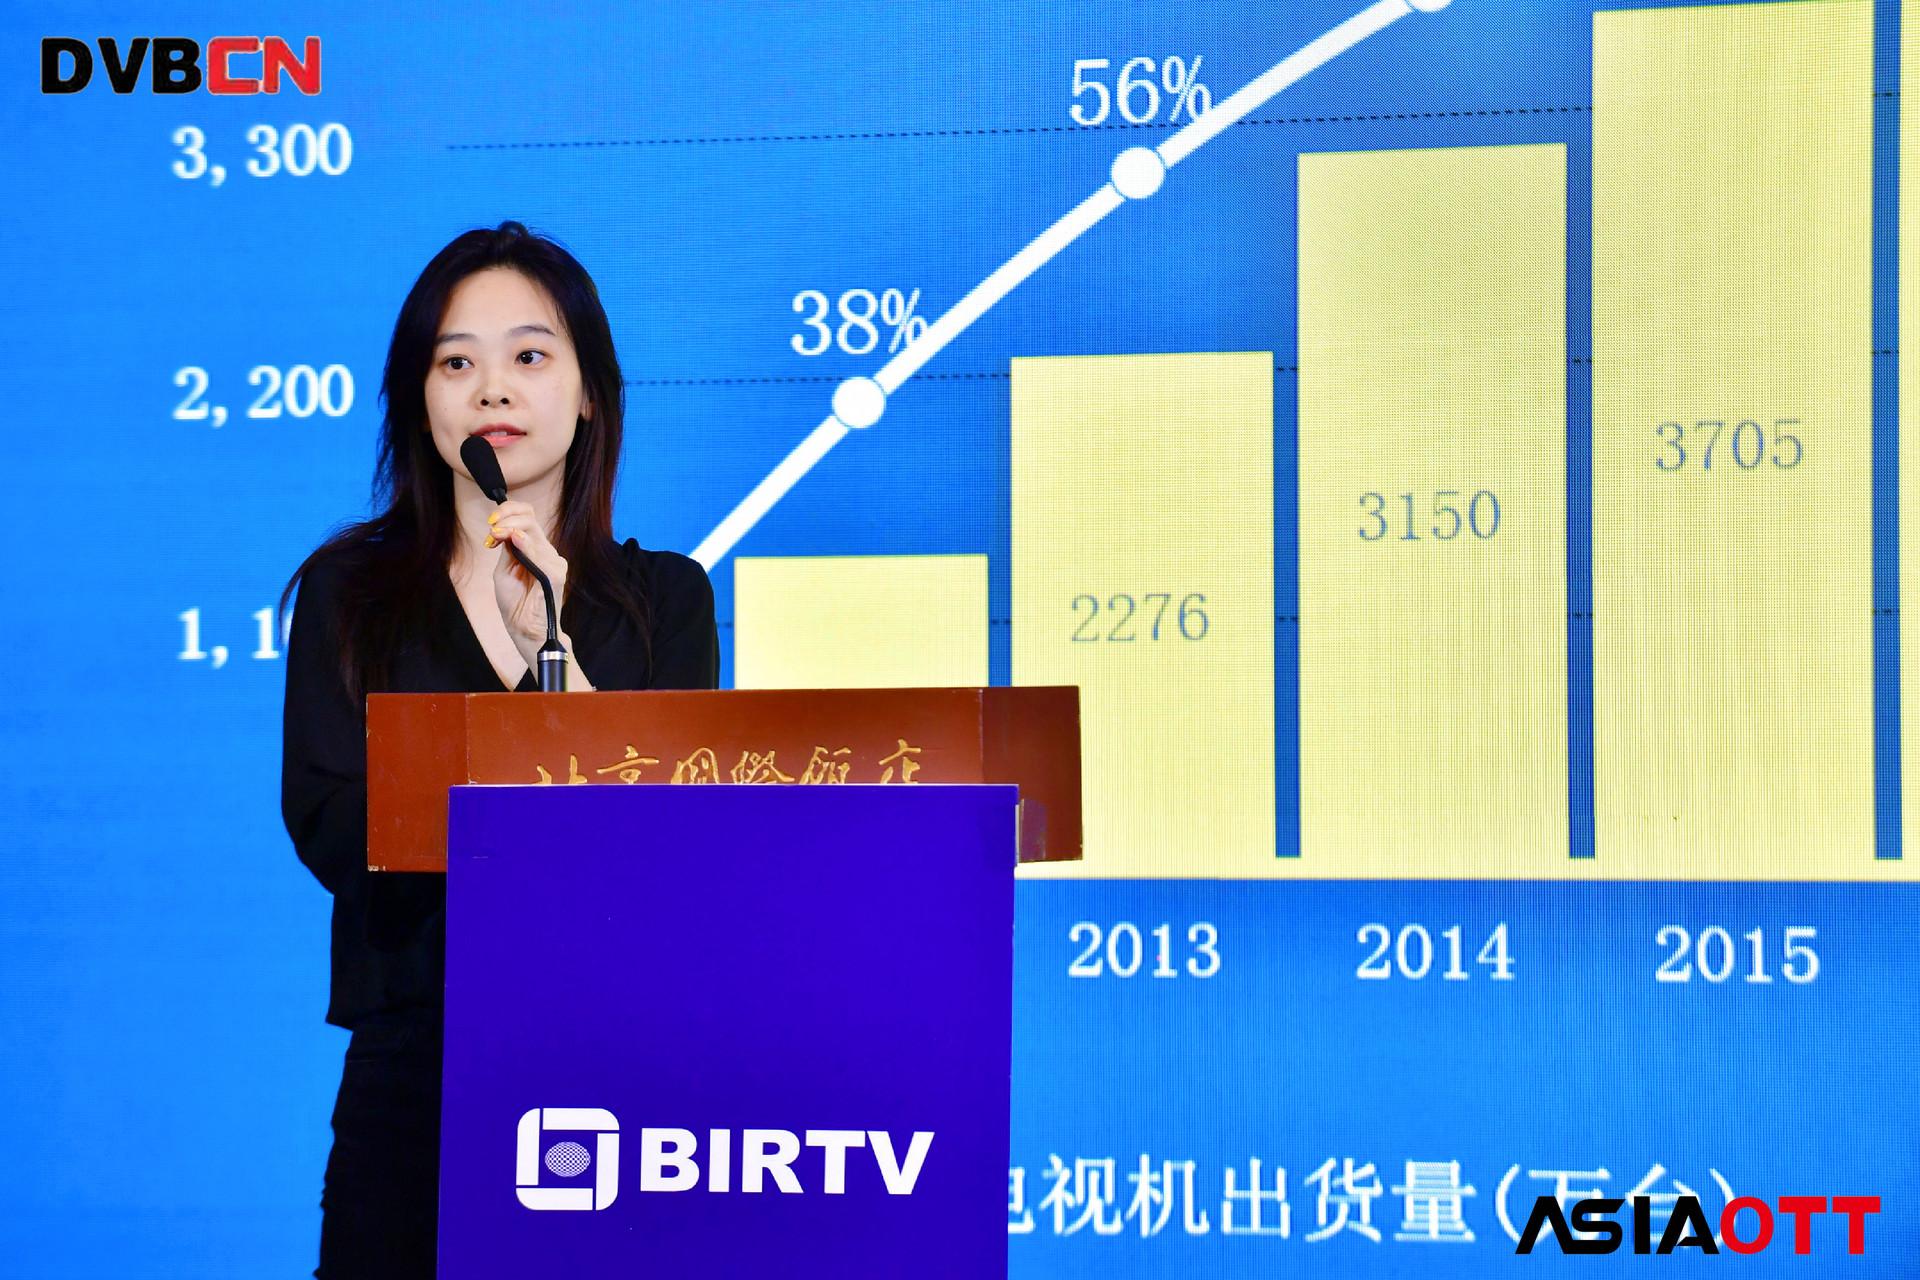 【BIRTV2019】尼尔森网联胡若楠:OTT赶上IPTV用户量级,2019Q2共同趋向2.8亿